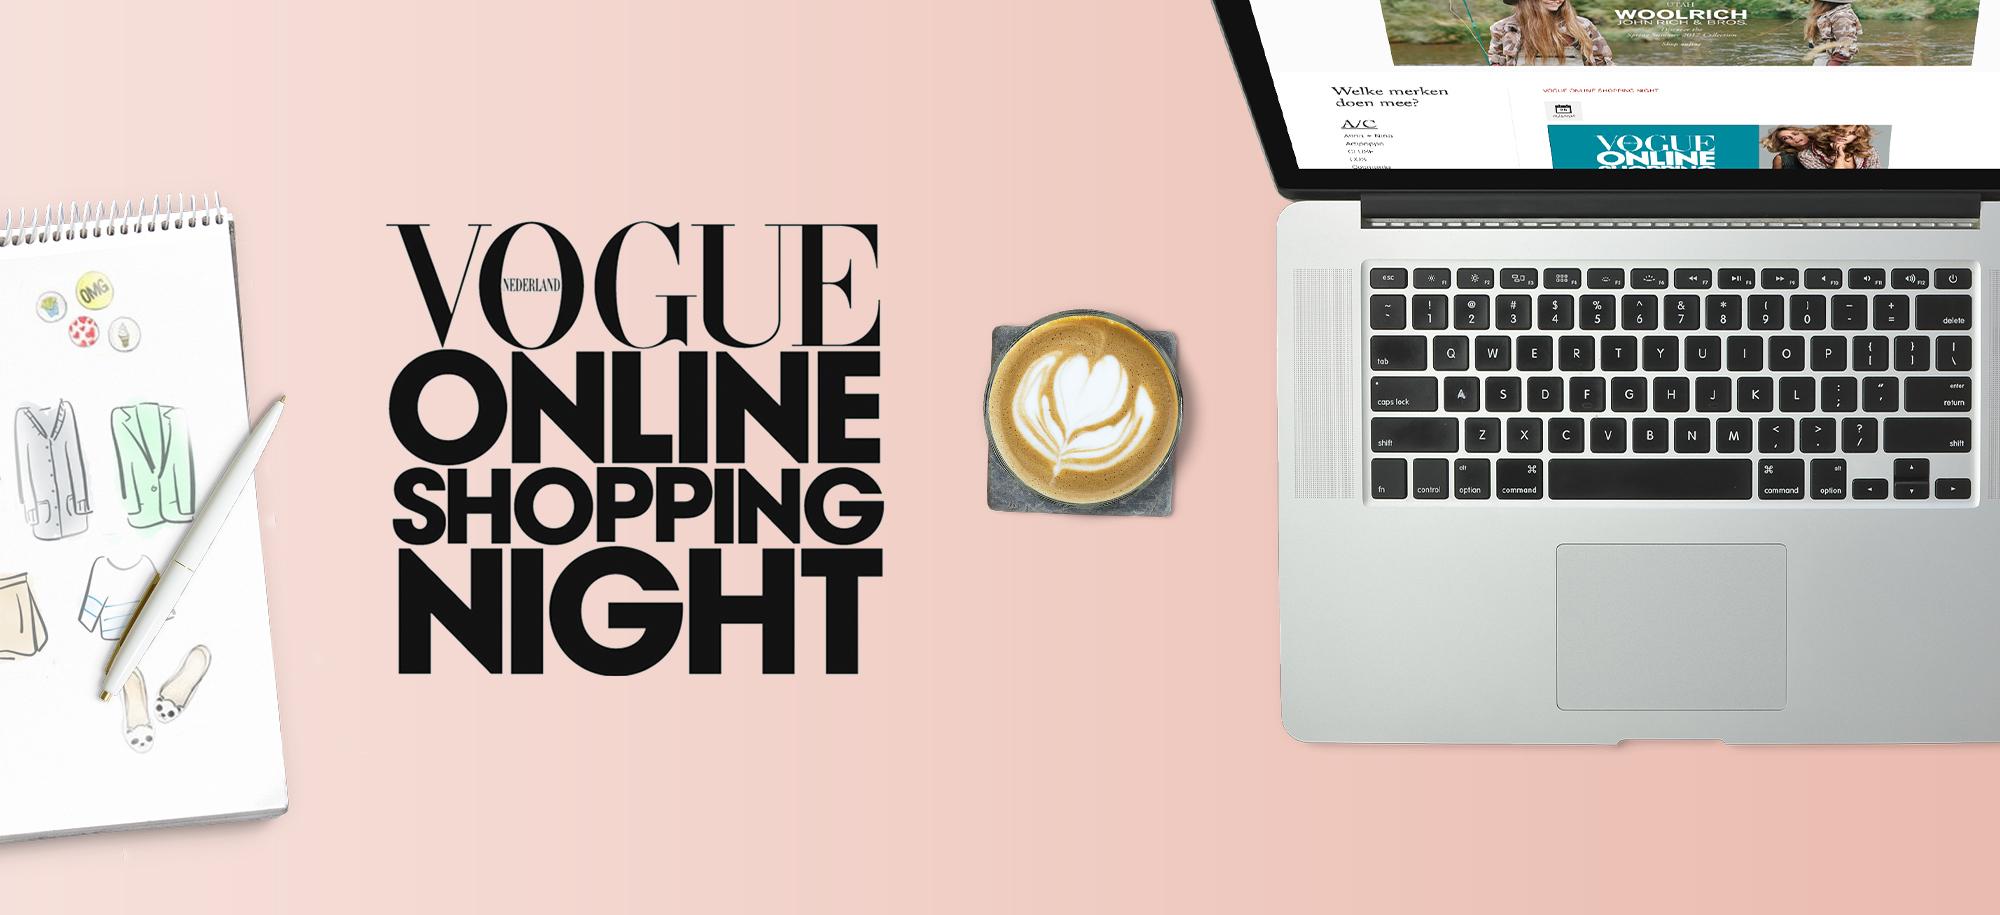 Vogue Online Shopping Night